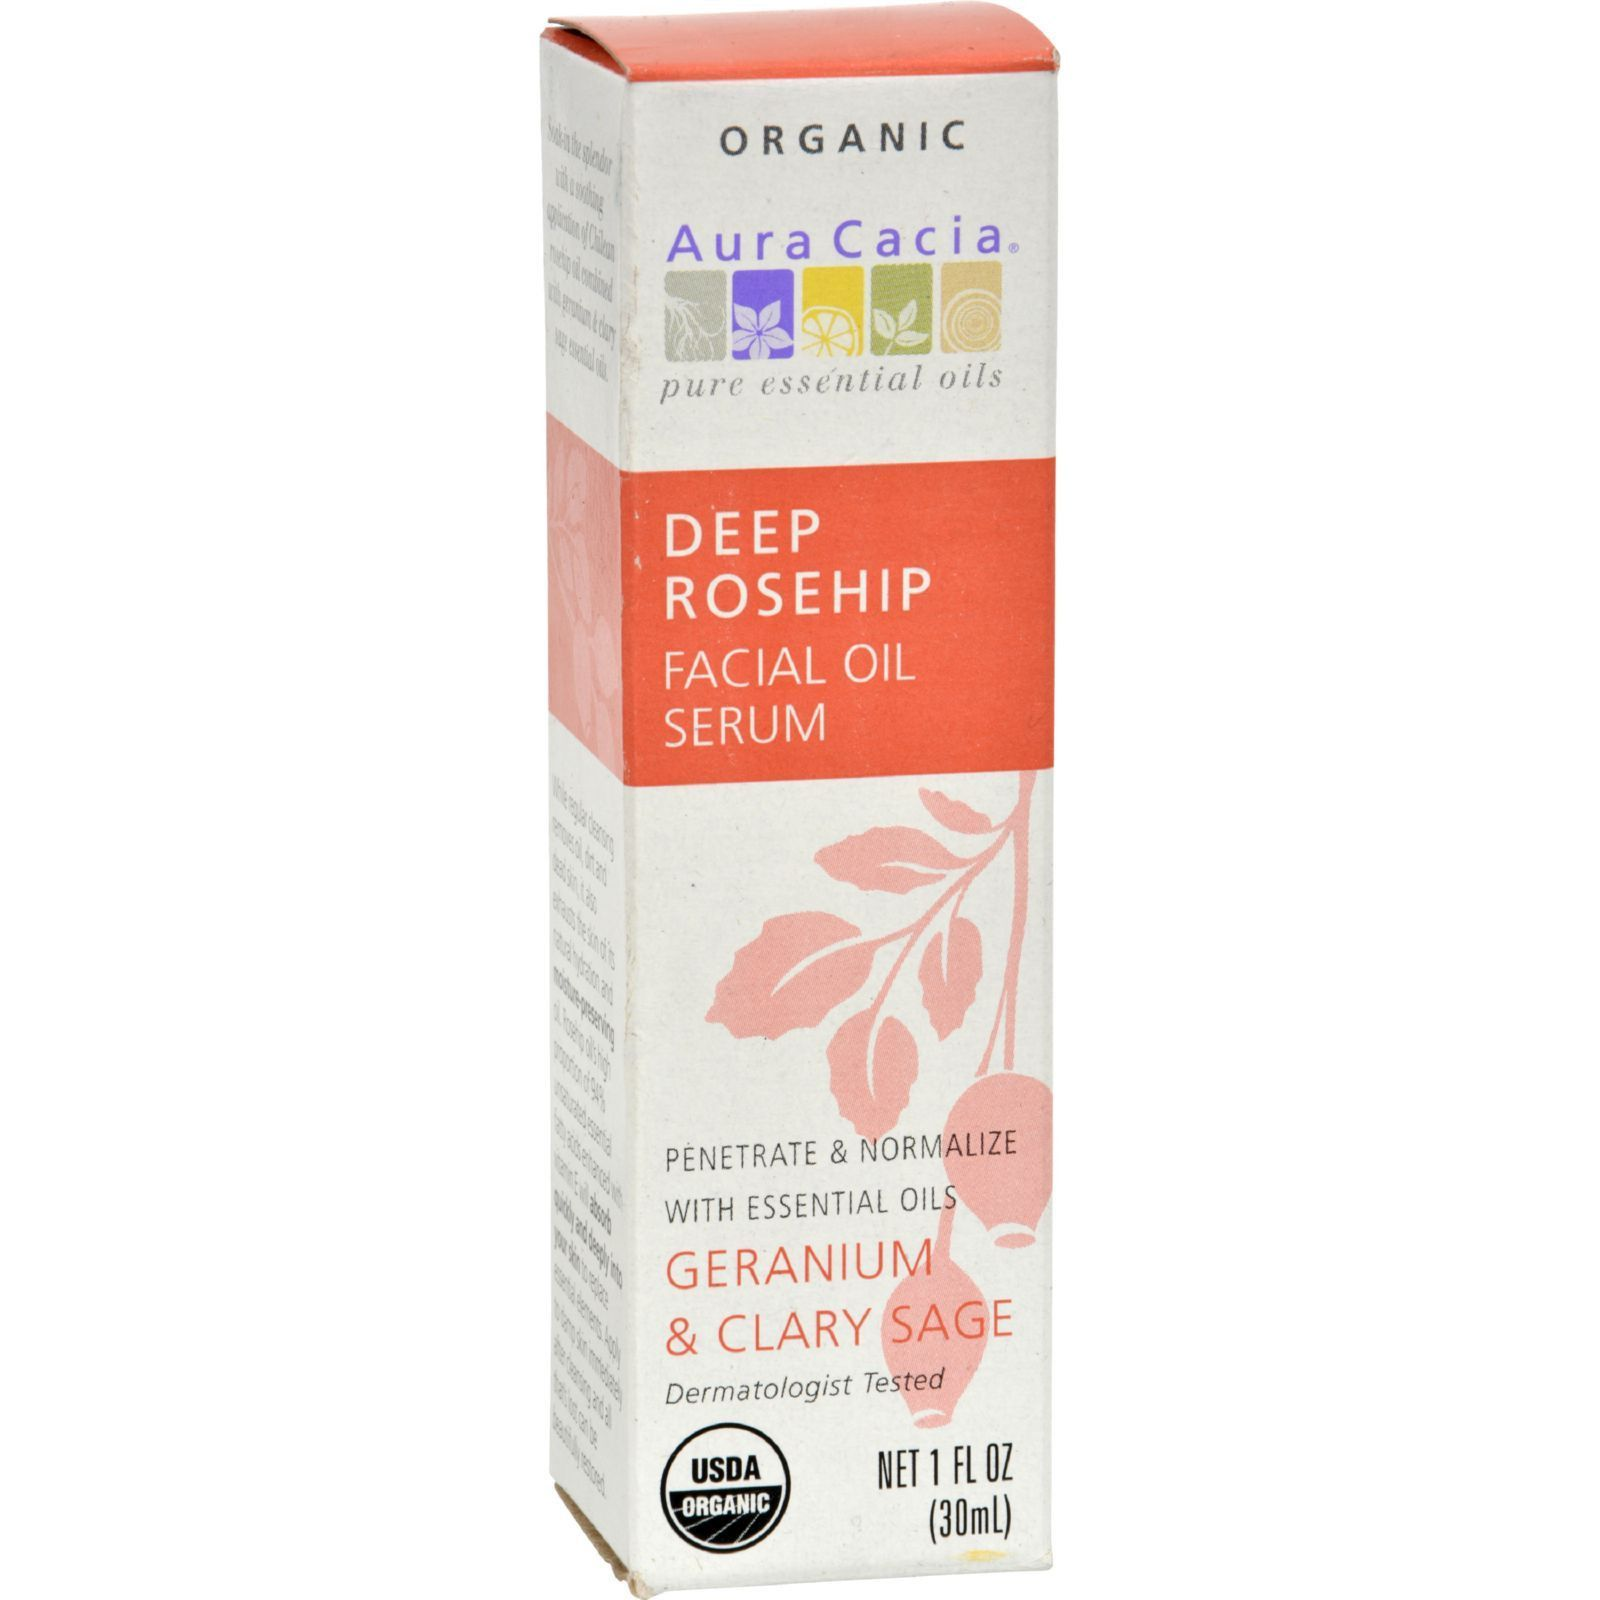 Aura Cacia Organic Face Oil Serum